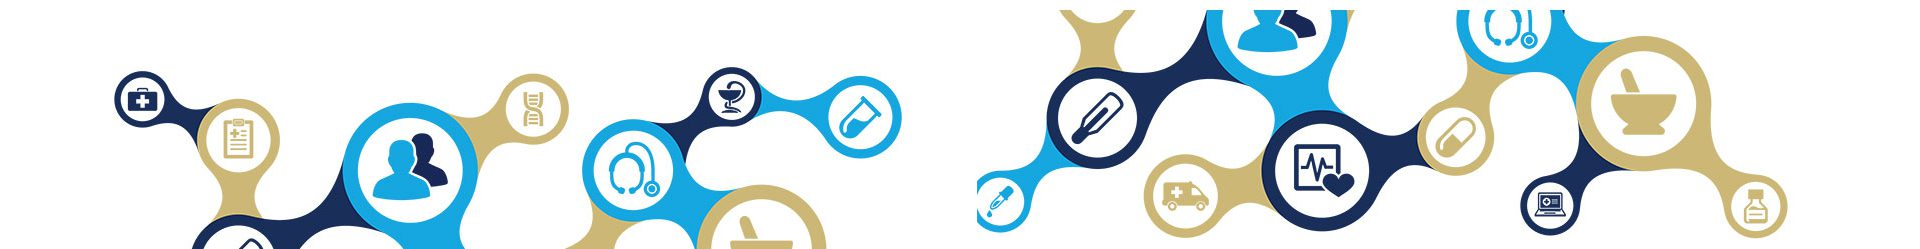 Pharmacy Innovation Network